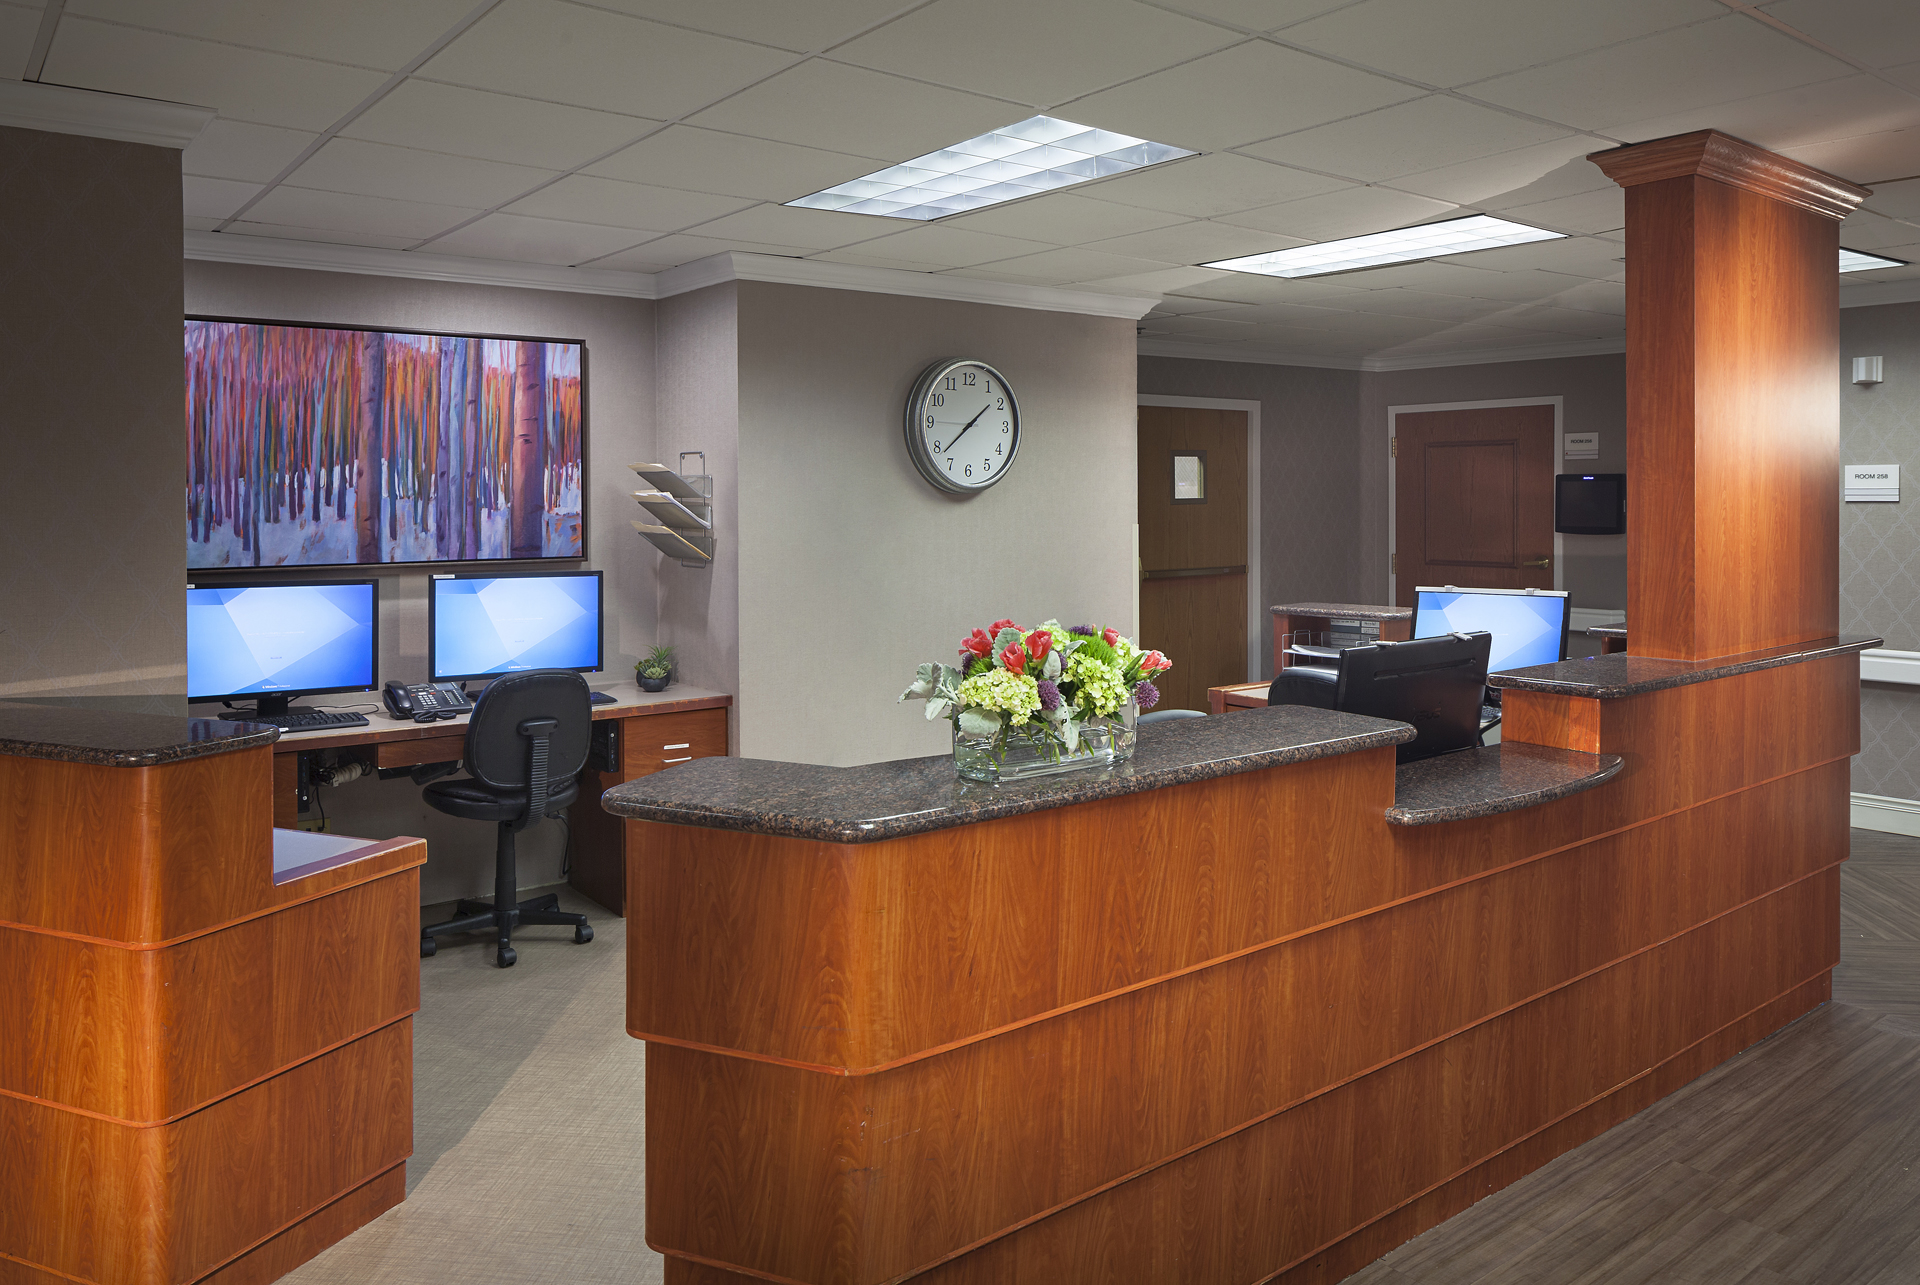 Glenview Terrace - Healthcare Center